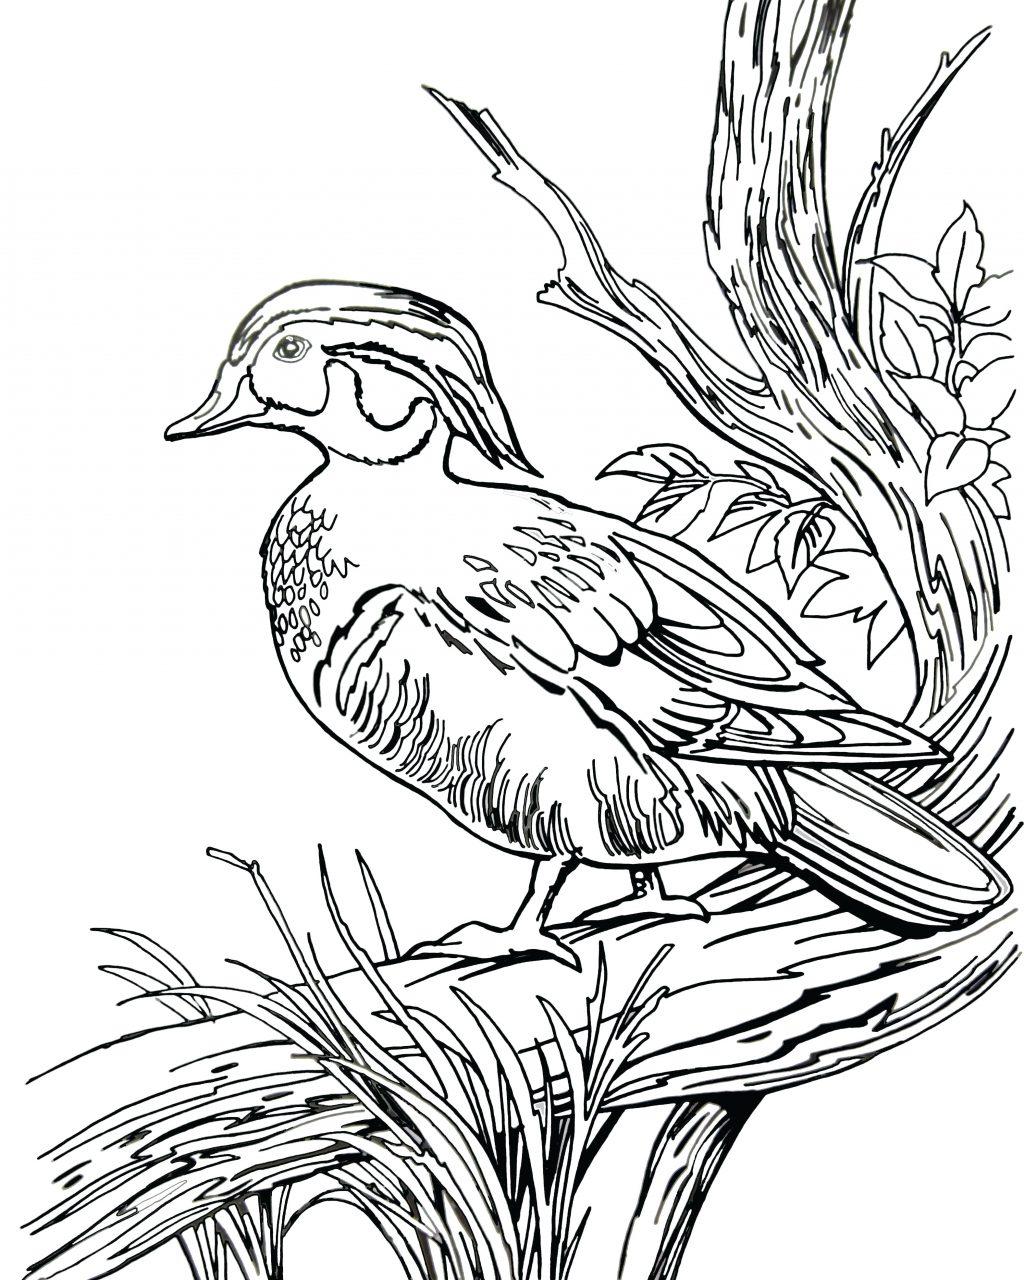 Duck Hunting Drawing At Getdrawings